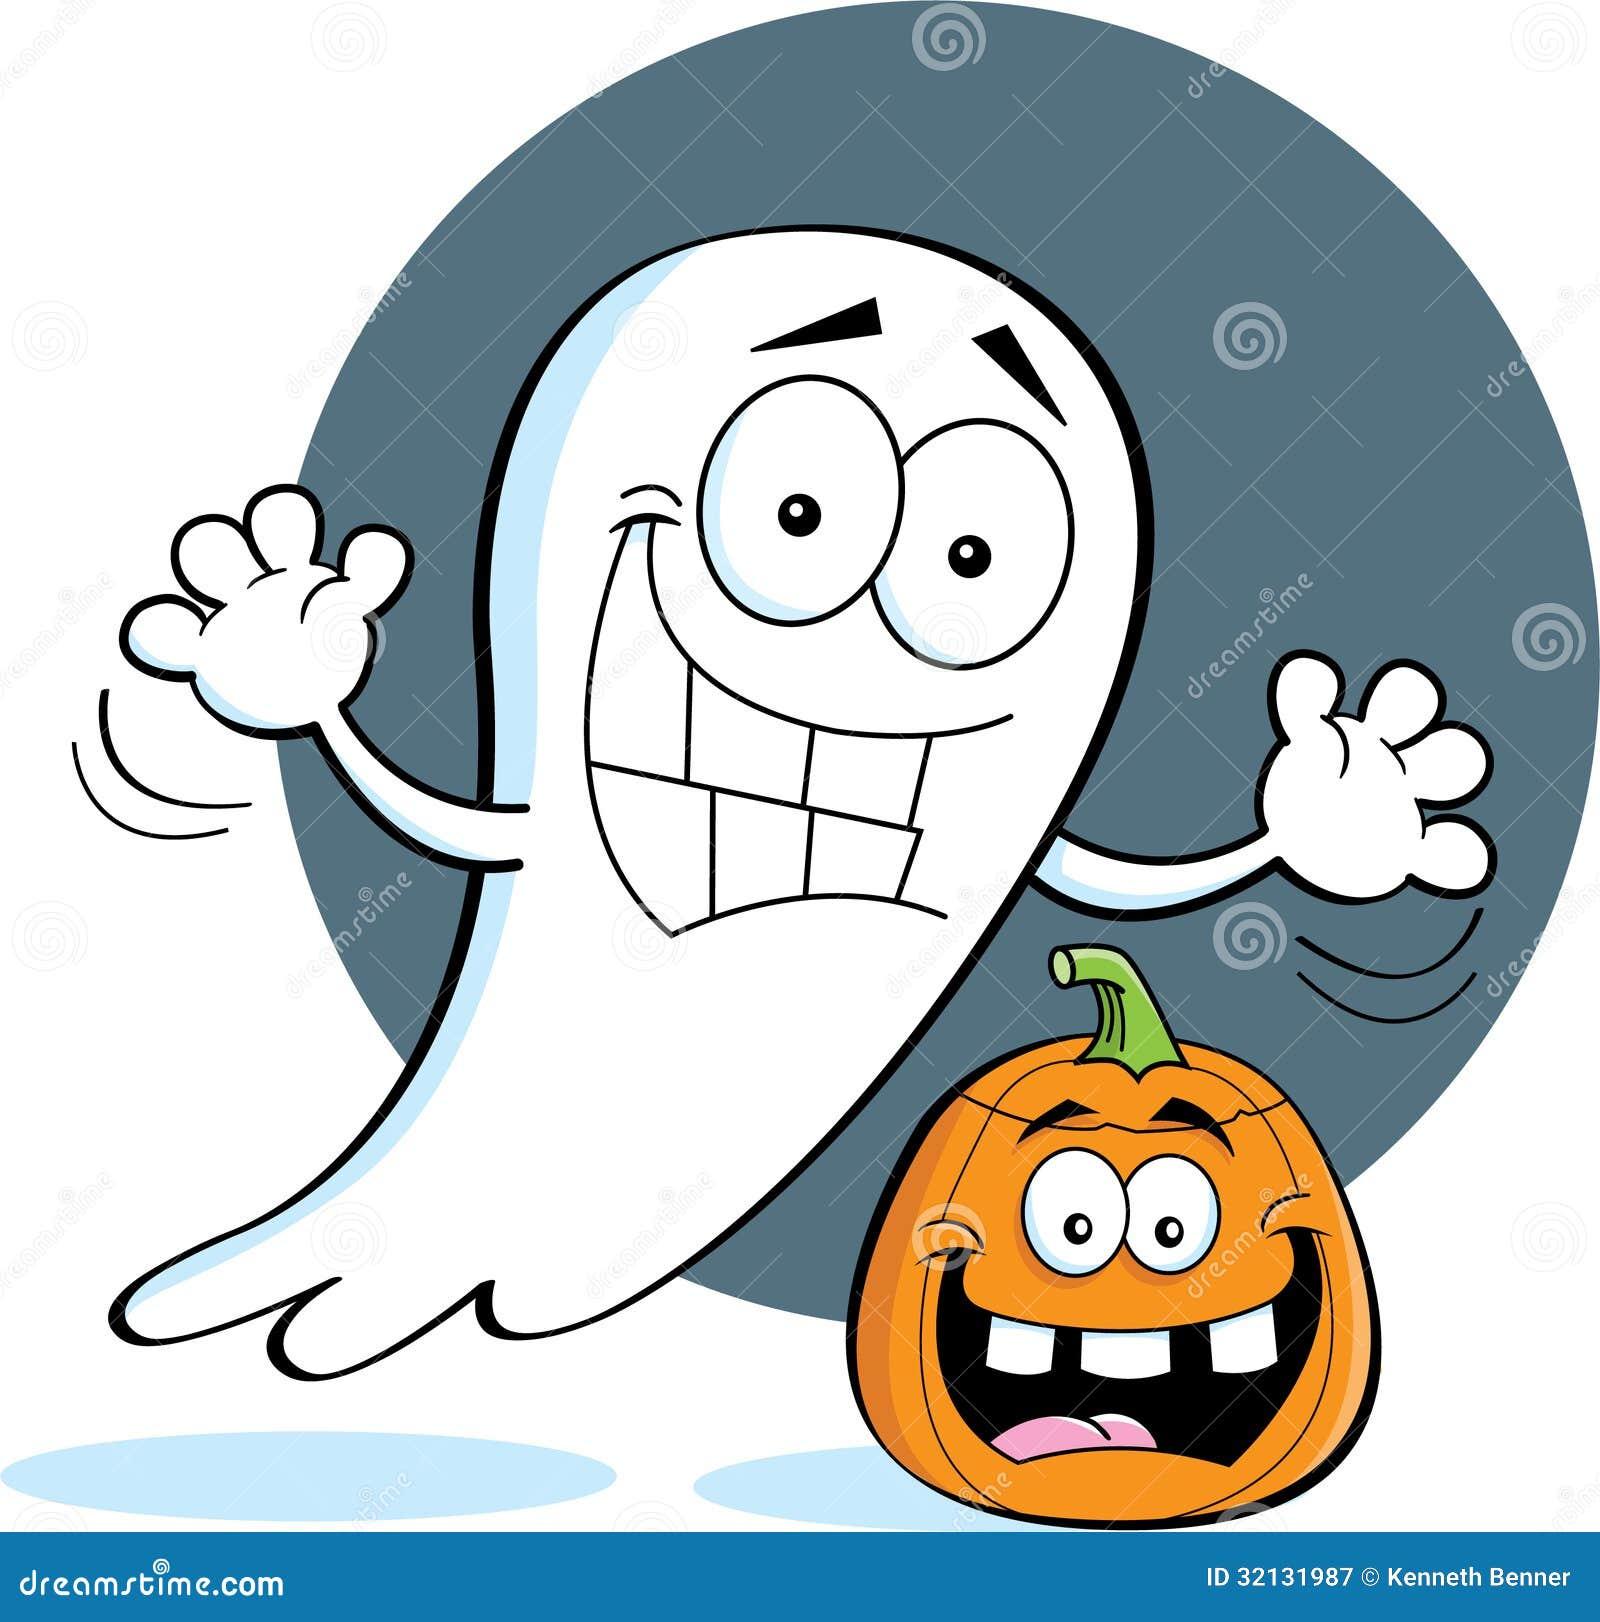 Cartoon Ghost With A Pumpkin Stock Vector